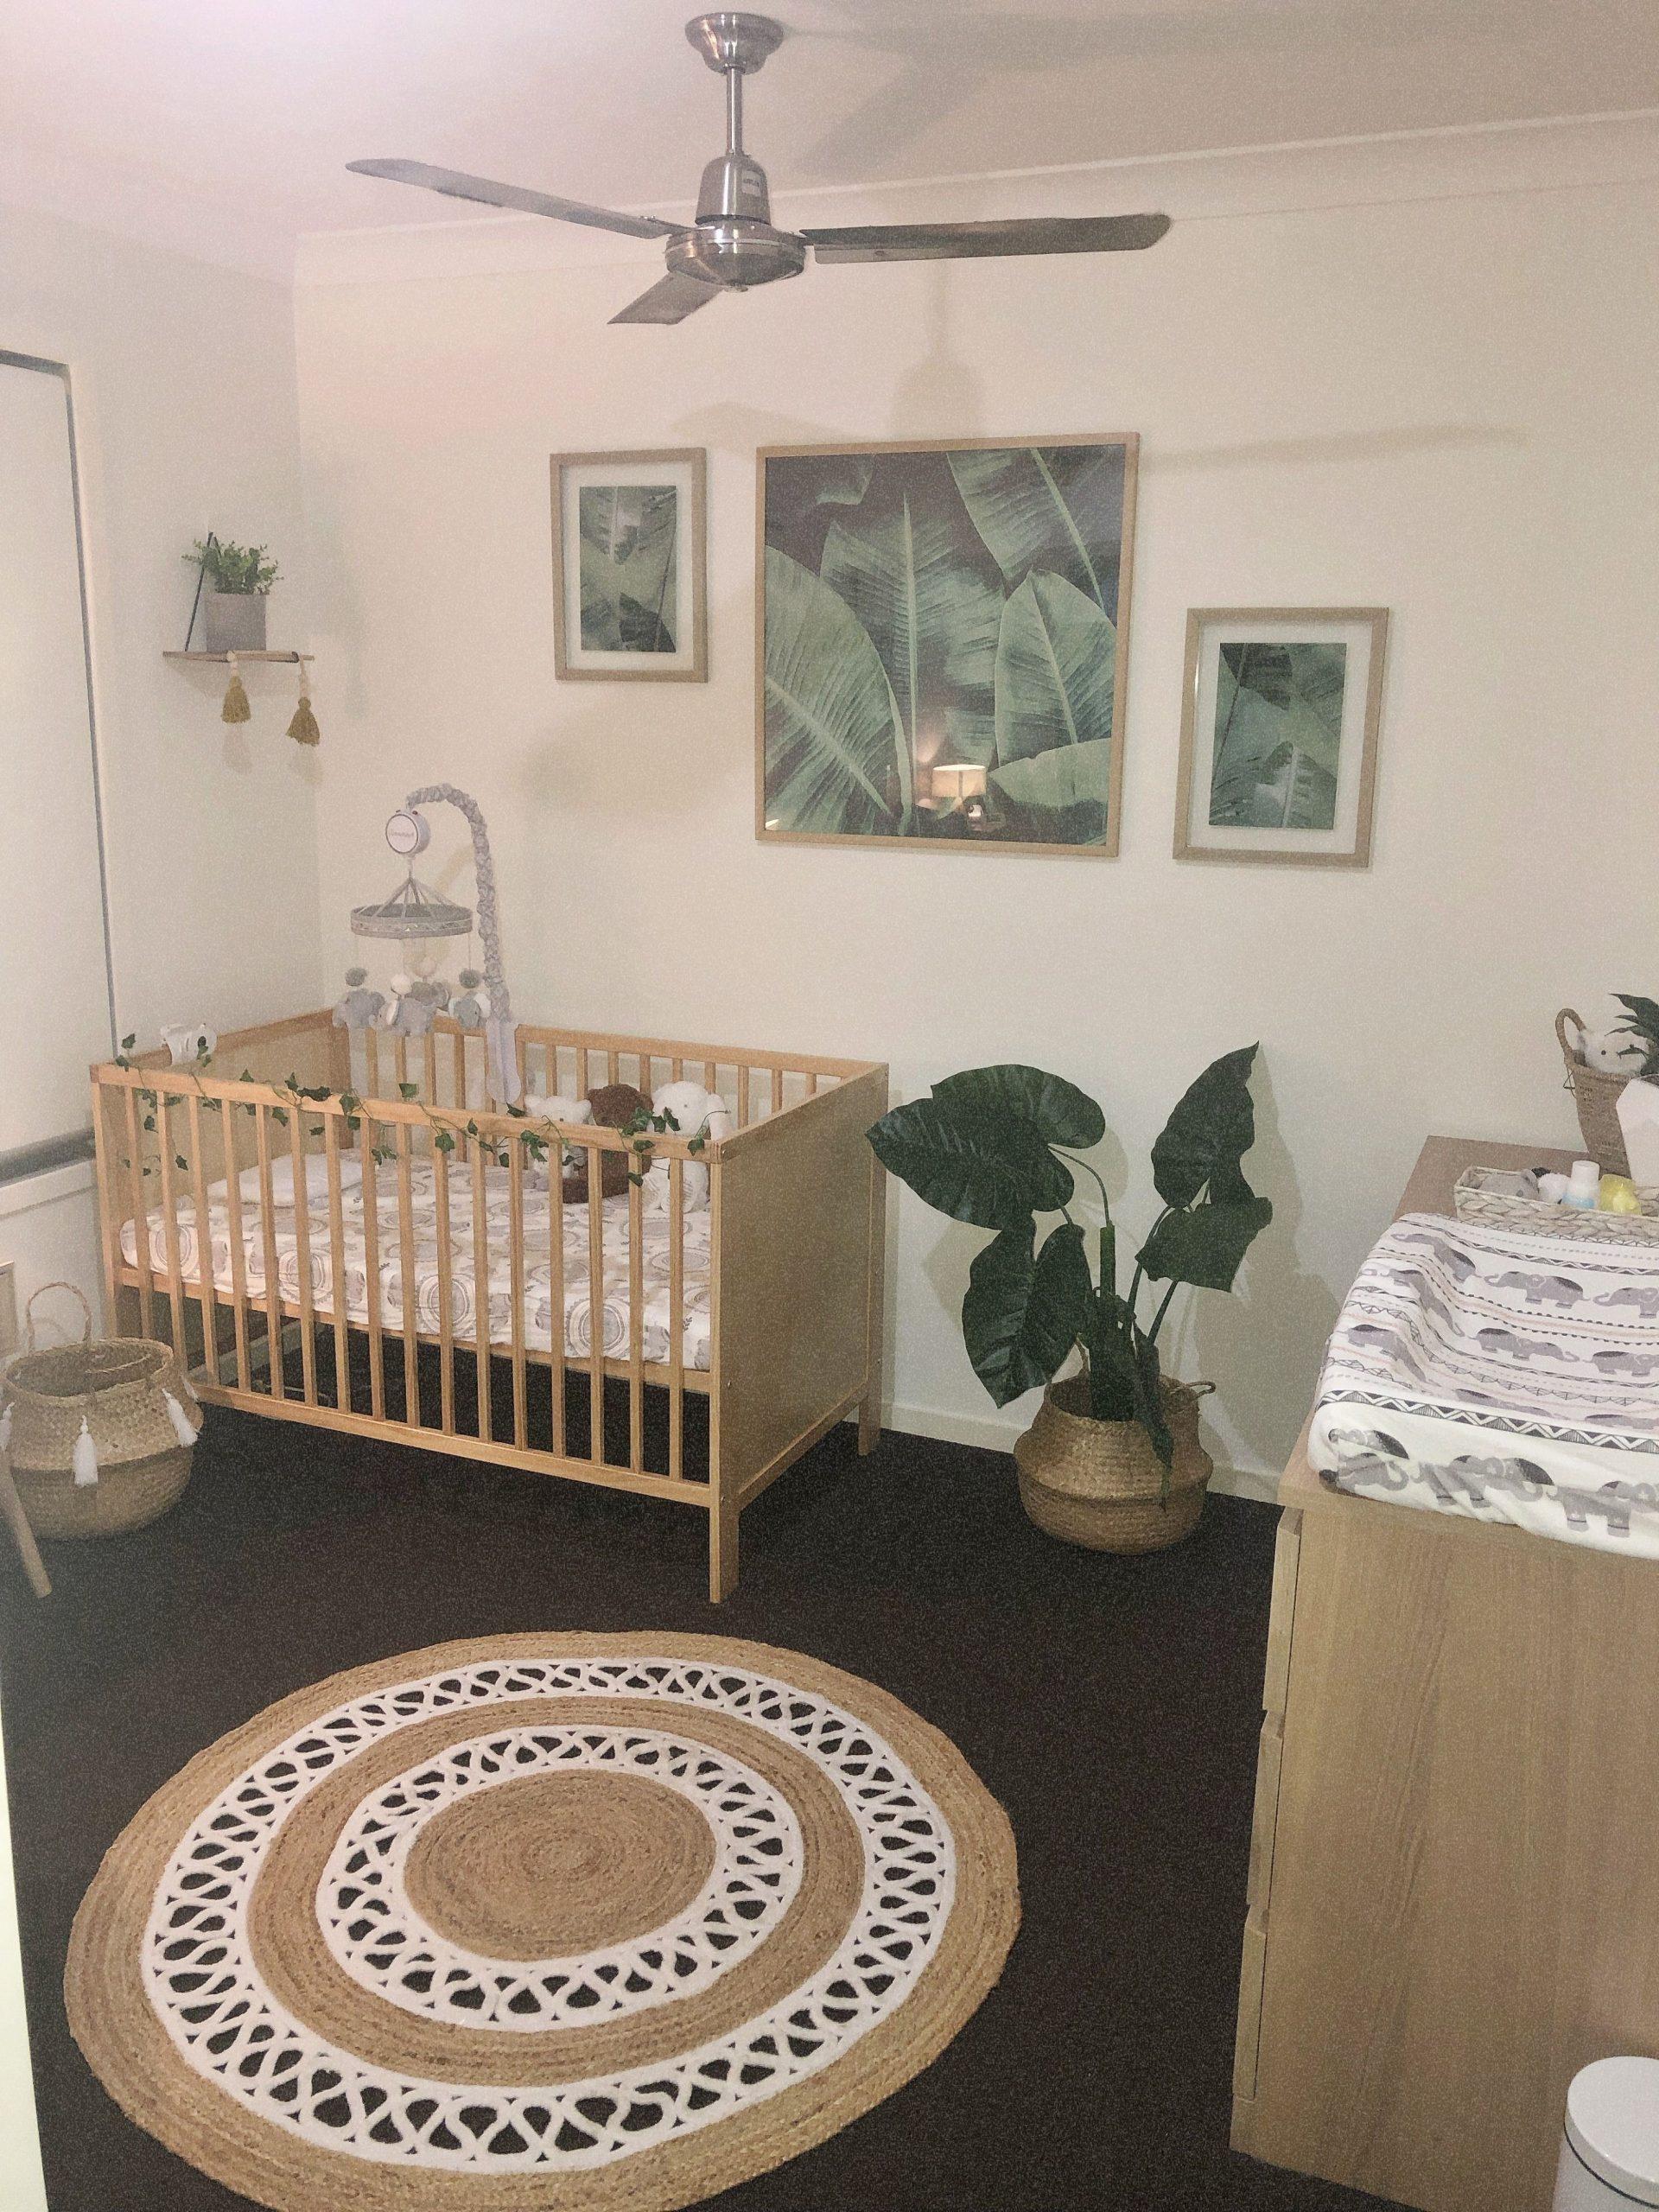 mockaaustralia #kmartaustralia #bigwaustralia #ikeaaustralia  - Baby Room Kmart